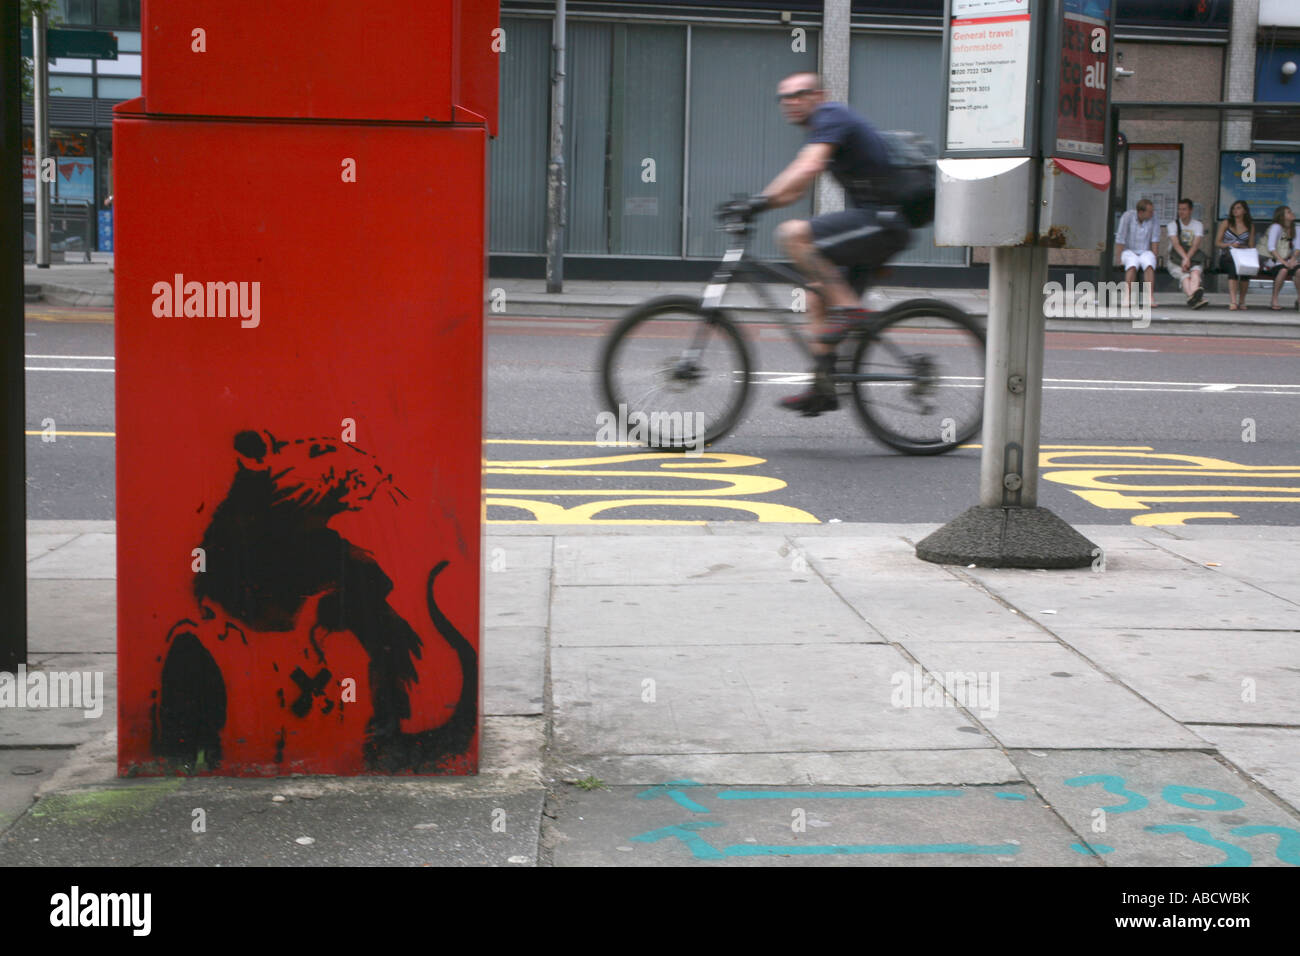 Banksy TOXIC RAT stencil, Euston, London - Stock Image